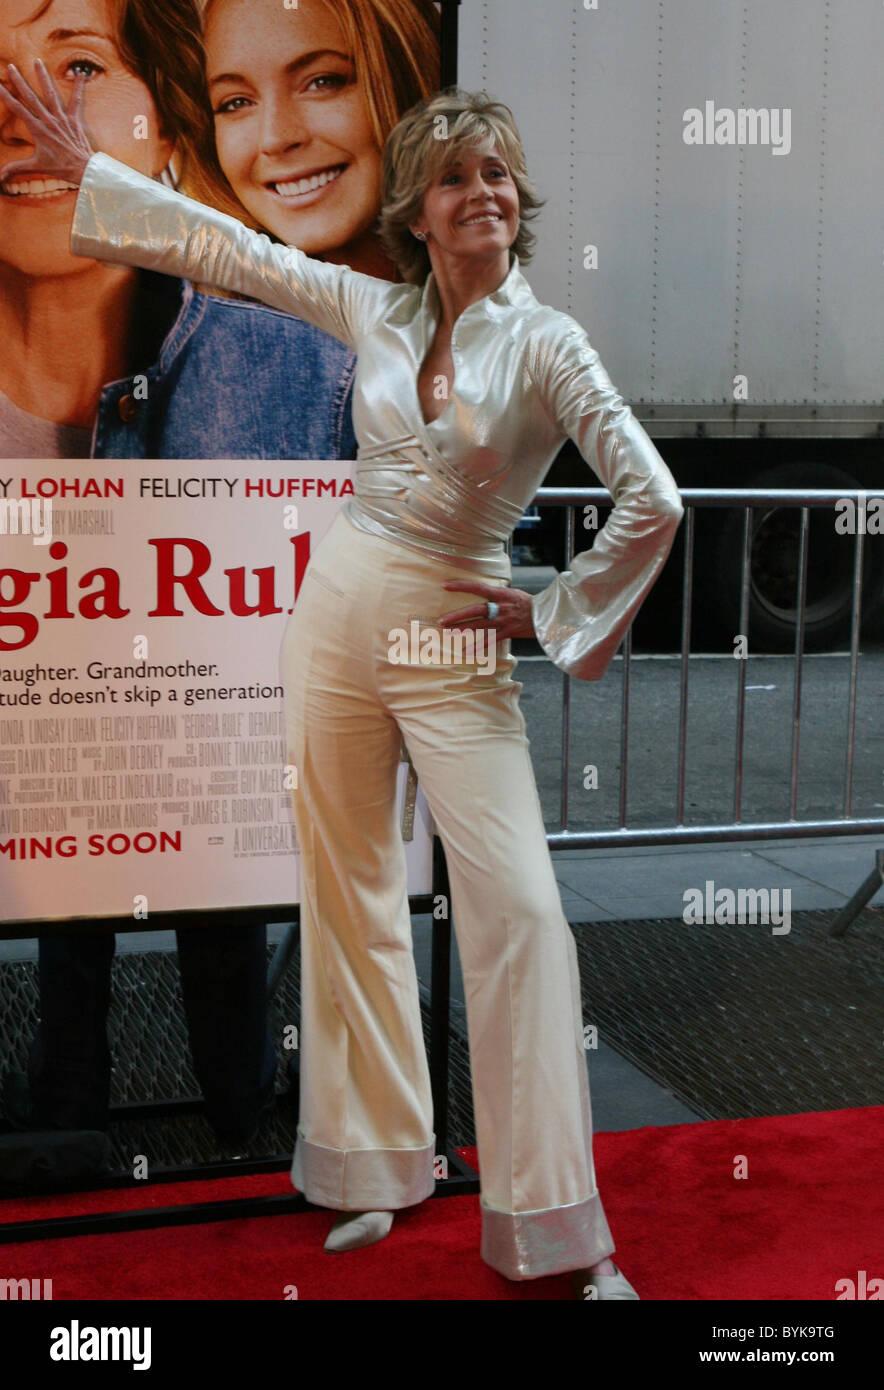 Celestia vega porn video twitch star masturbates with pink dildo,Cate Blanchett Ocean's 8 Erotic gallery Amber valletta 2019,Kiernan shipka attends dior dinner in los angeles